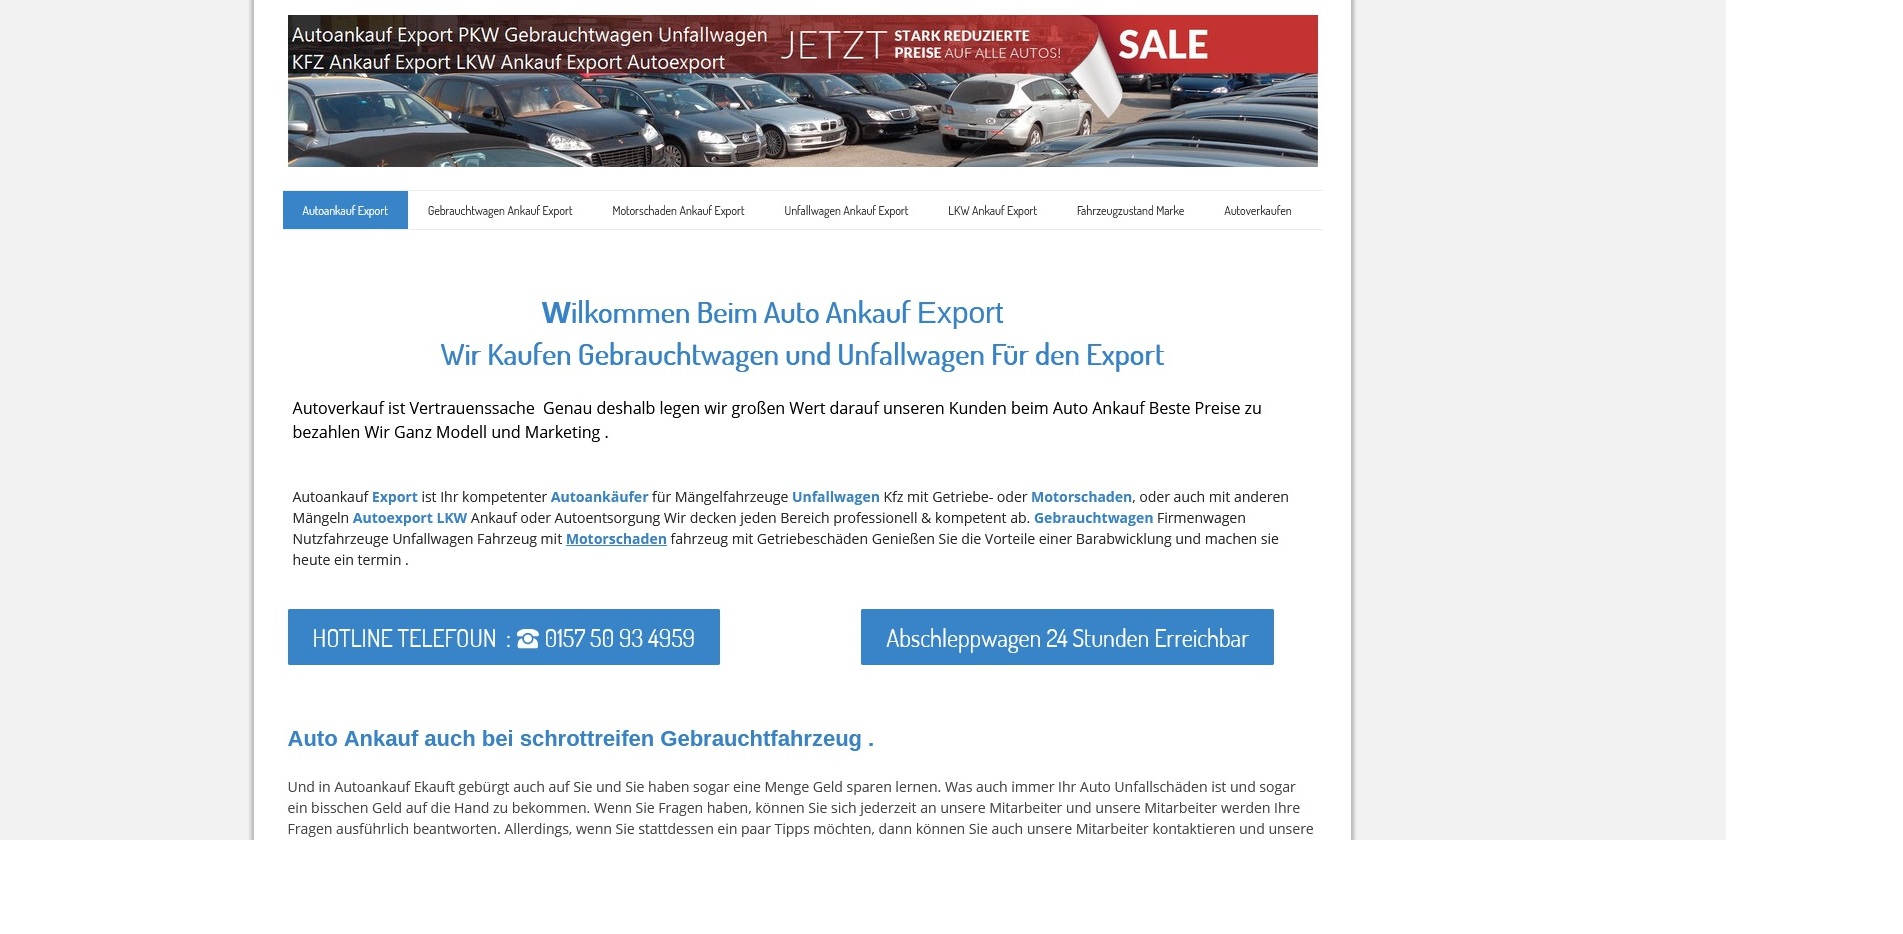 Kfz-Ankauf-export.de | Autoankauf Gotha | Autoankauf Export Gotha